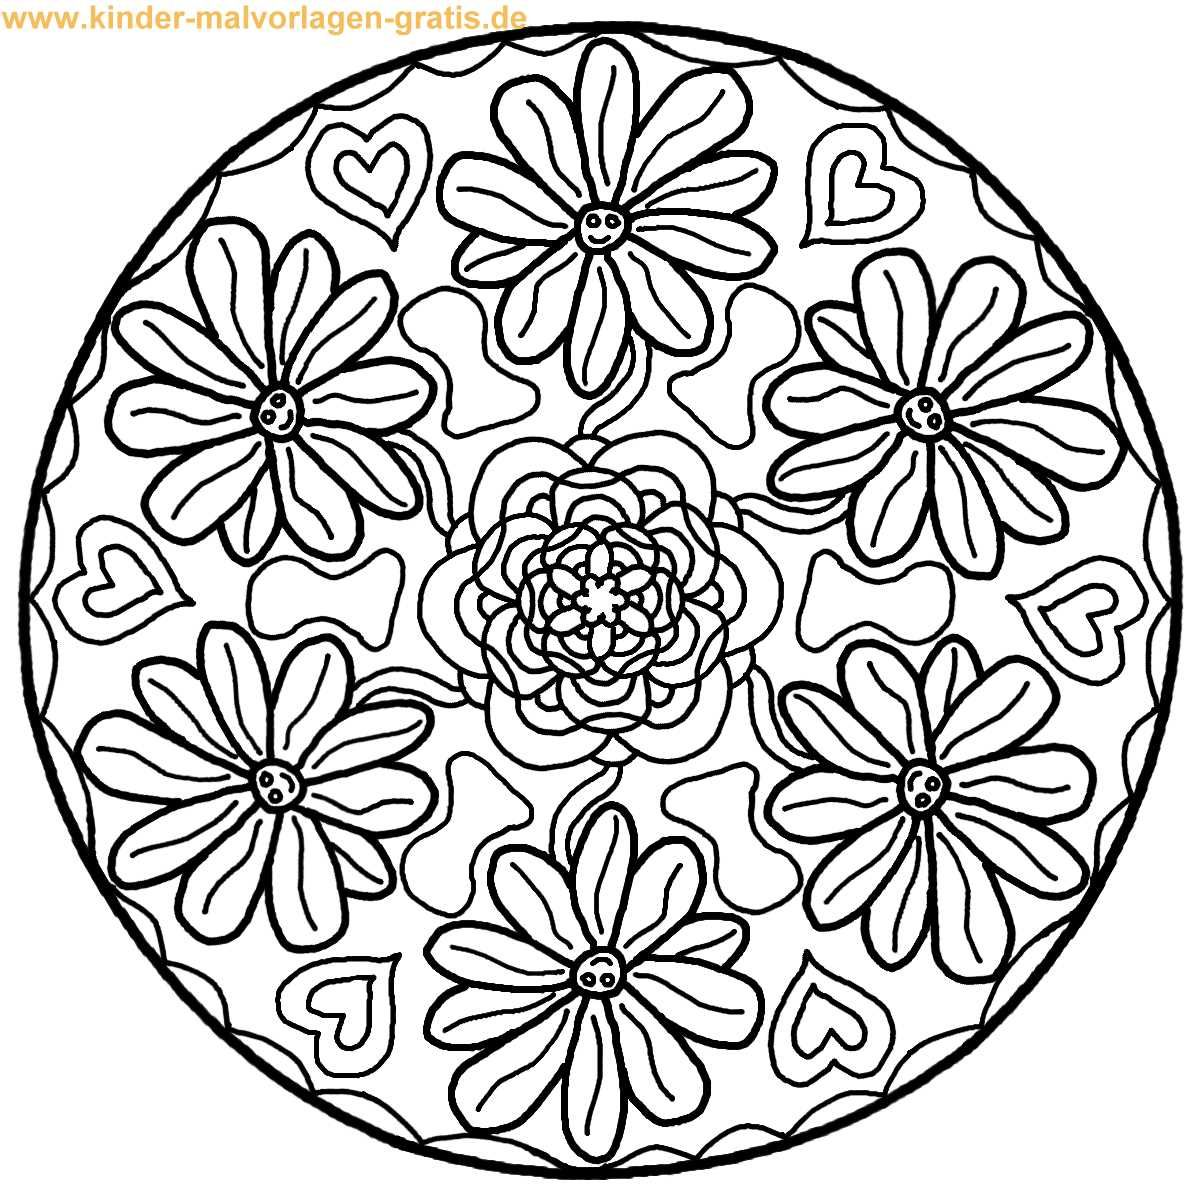 mandalas | Mandalas zum ausdrucken | Mandalas zum ausmalen ...